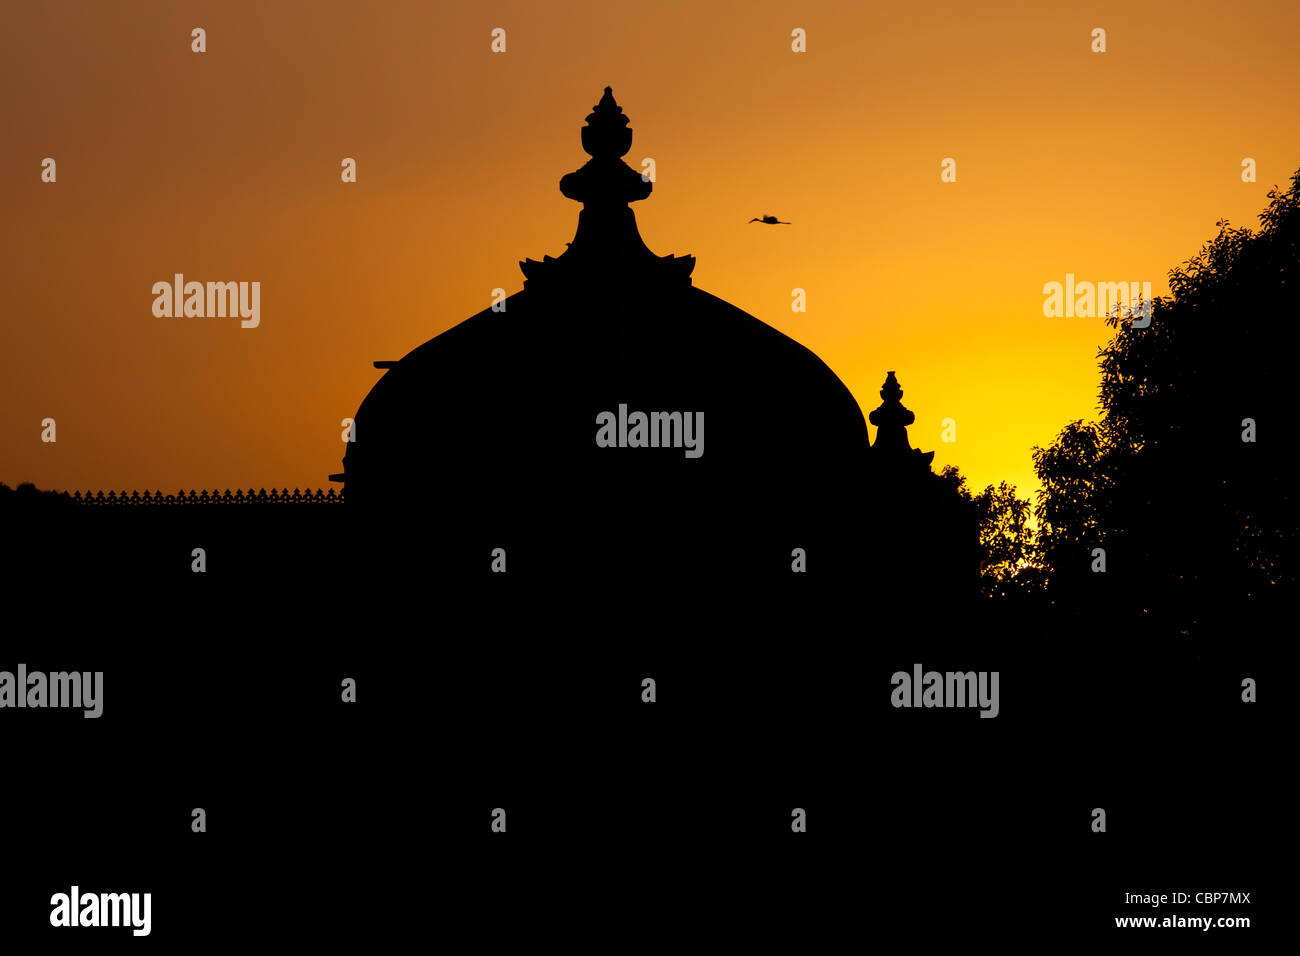 Gol Mahal Raj Angan annexe to The City Palace at sunset in Udaipur, Rajasthan, India - Stock Image